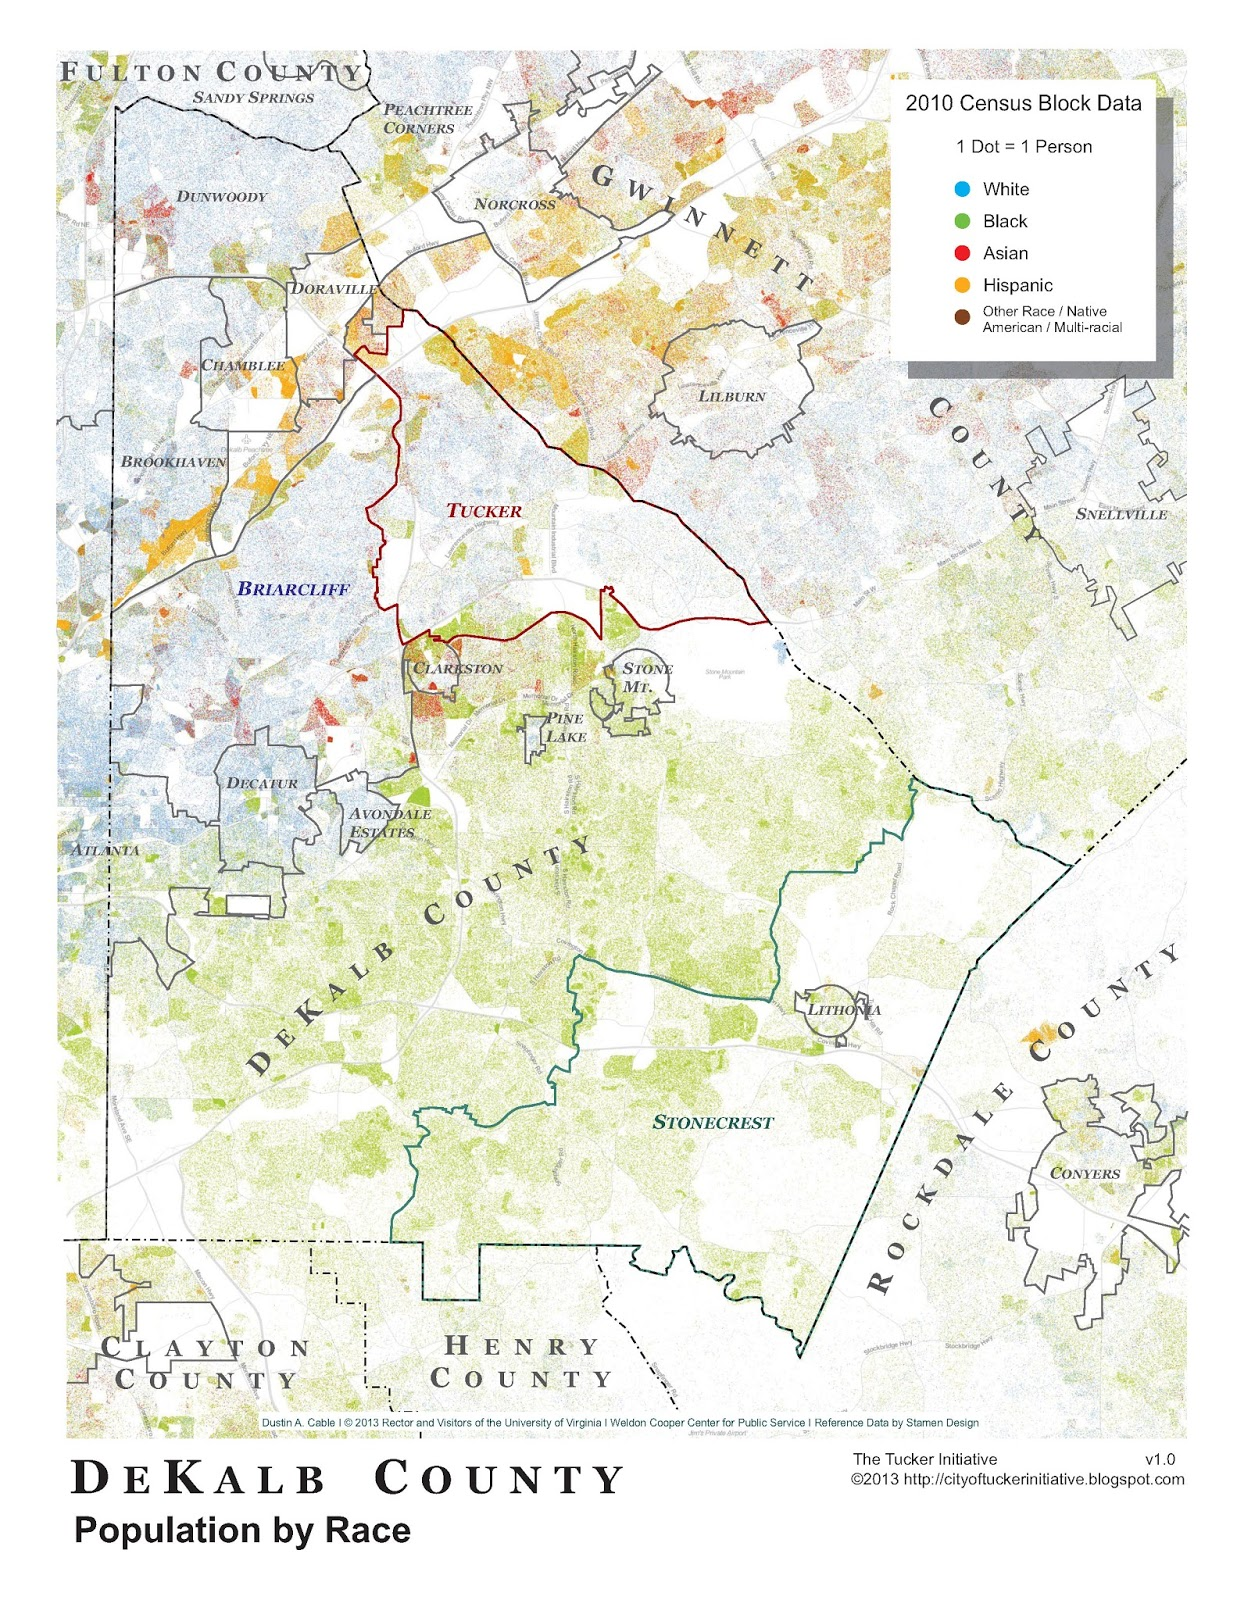 The City of Tucker Initiative: A Racial Dot Map of DeKalb County